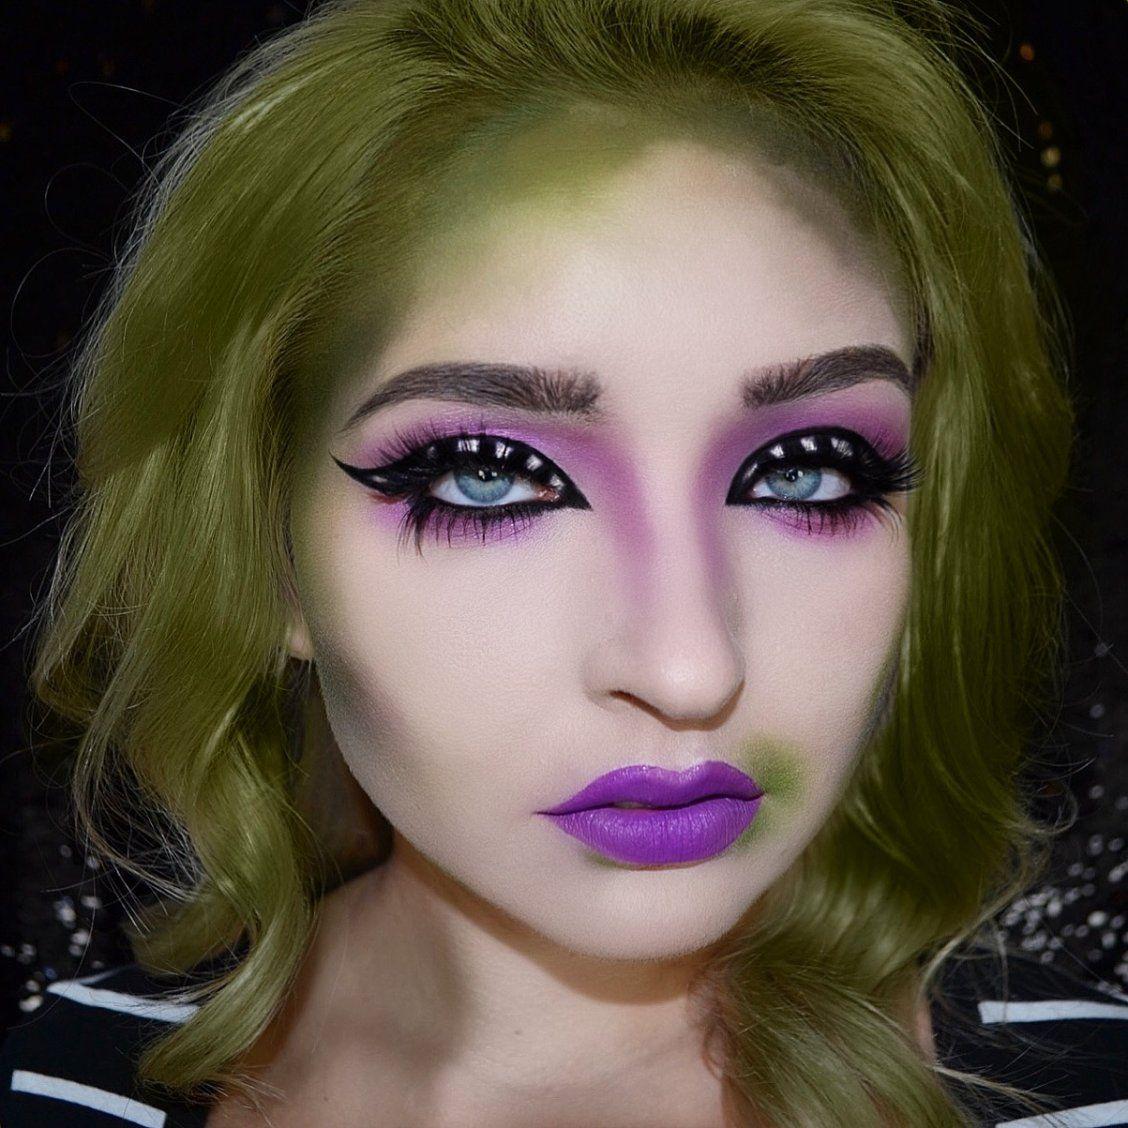 Using Grande Cosmetics Mascara by maddyryan14. Upload